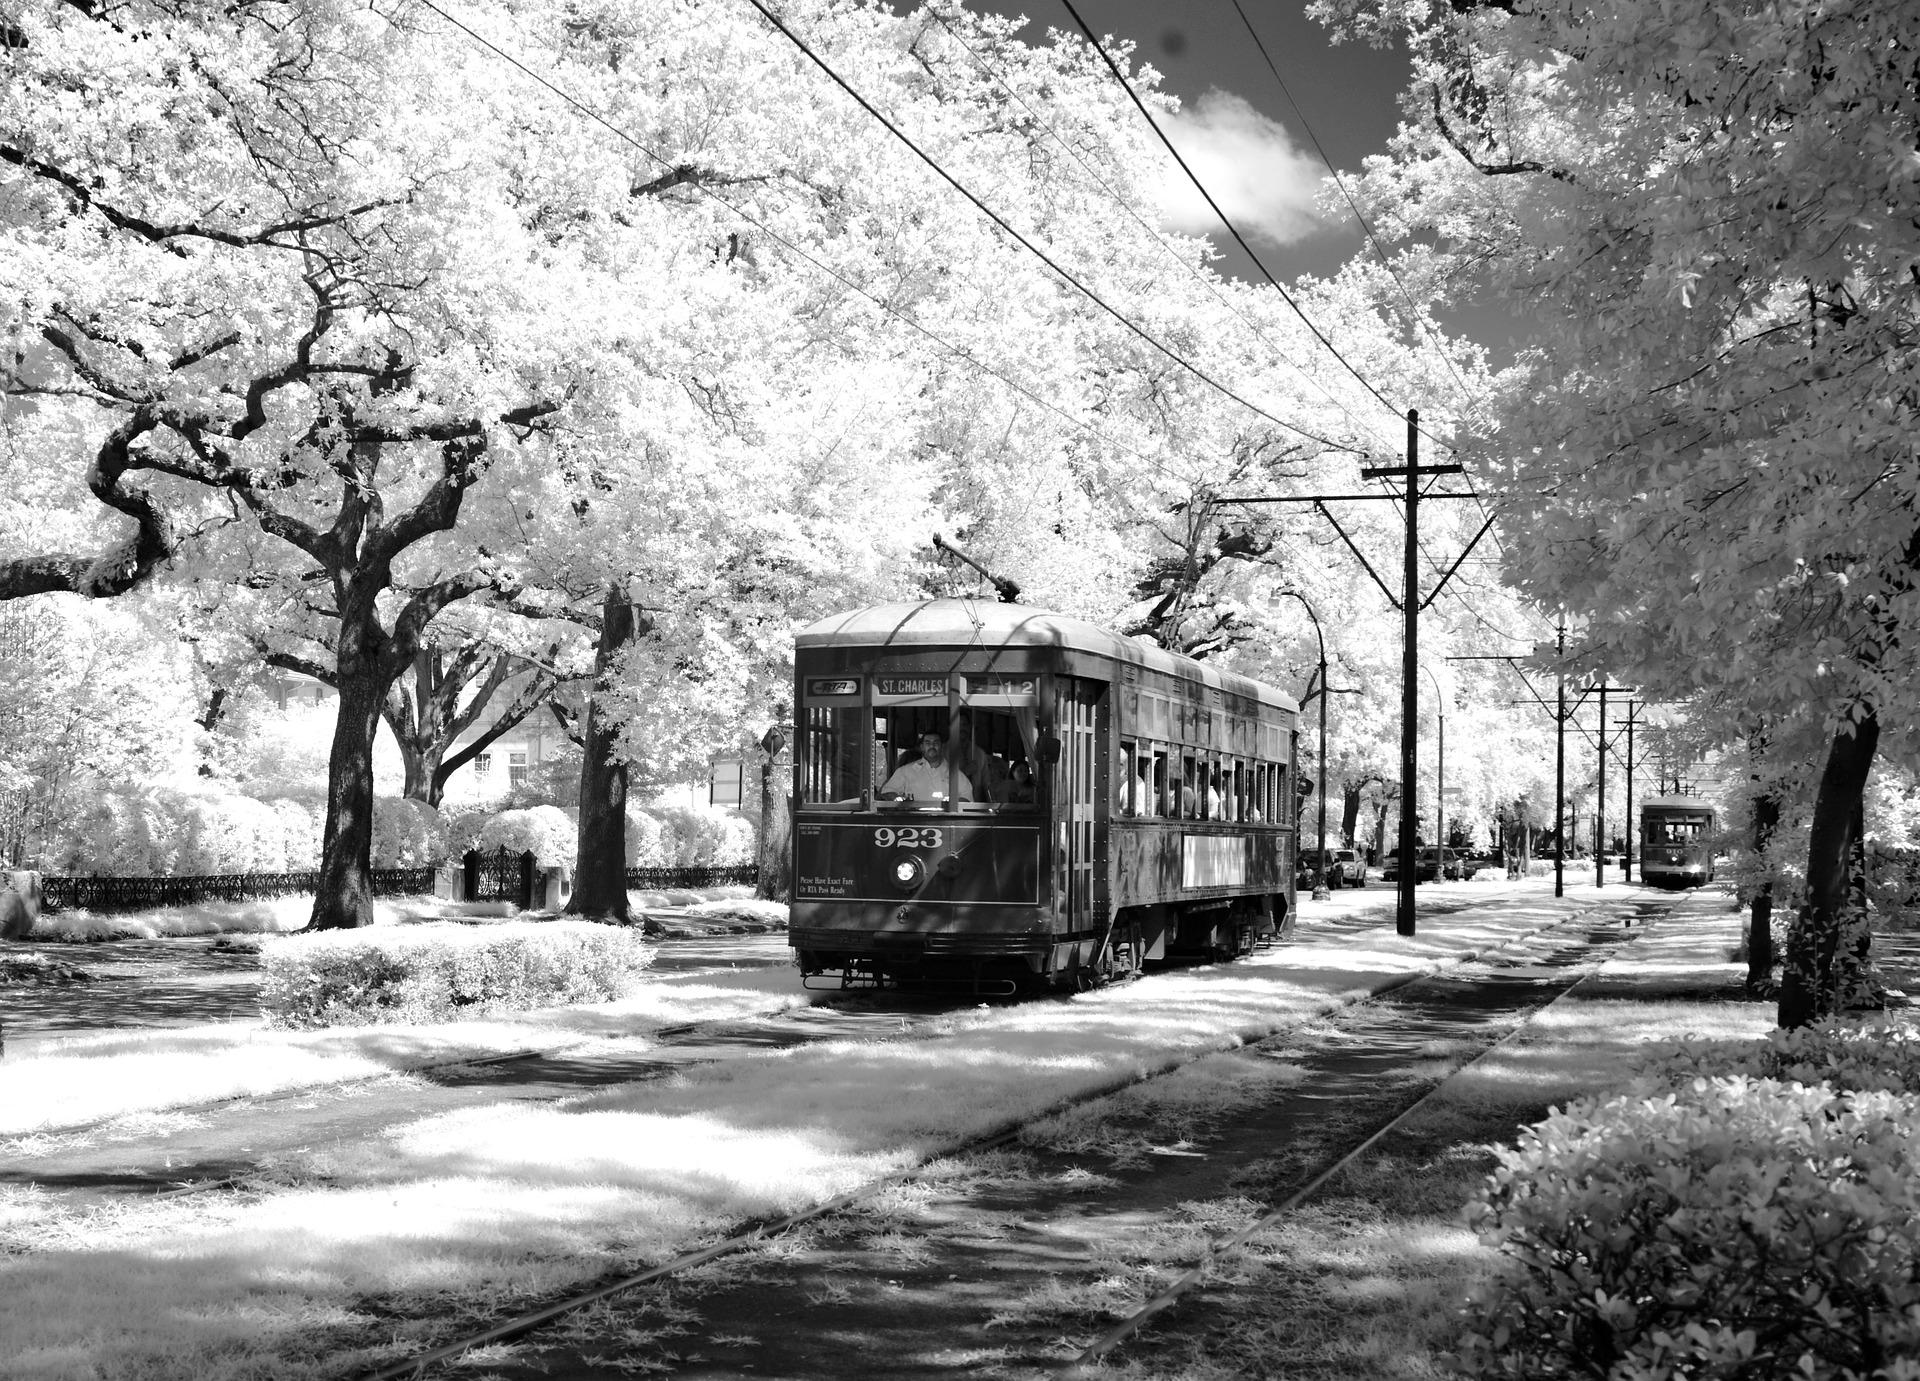 Tram Track, City, Rail, Railway, Service, HQ Photo